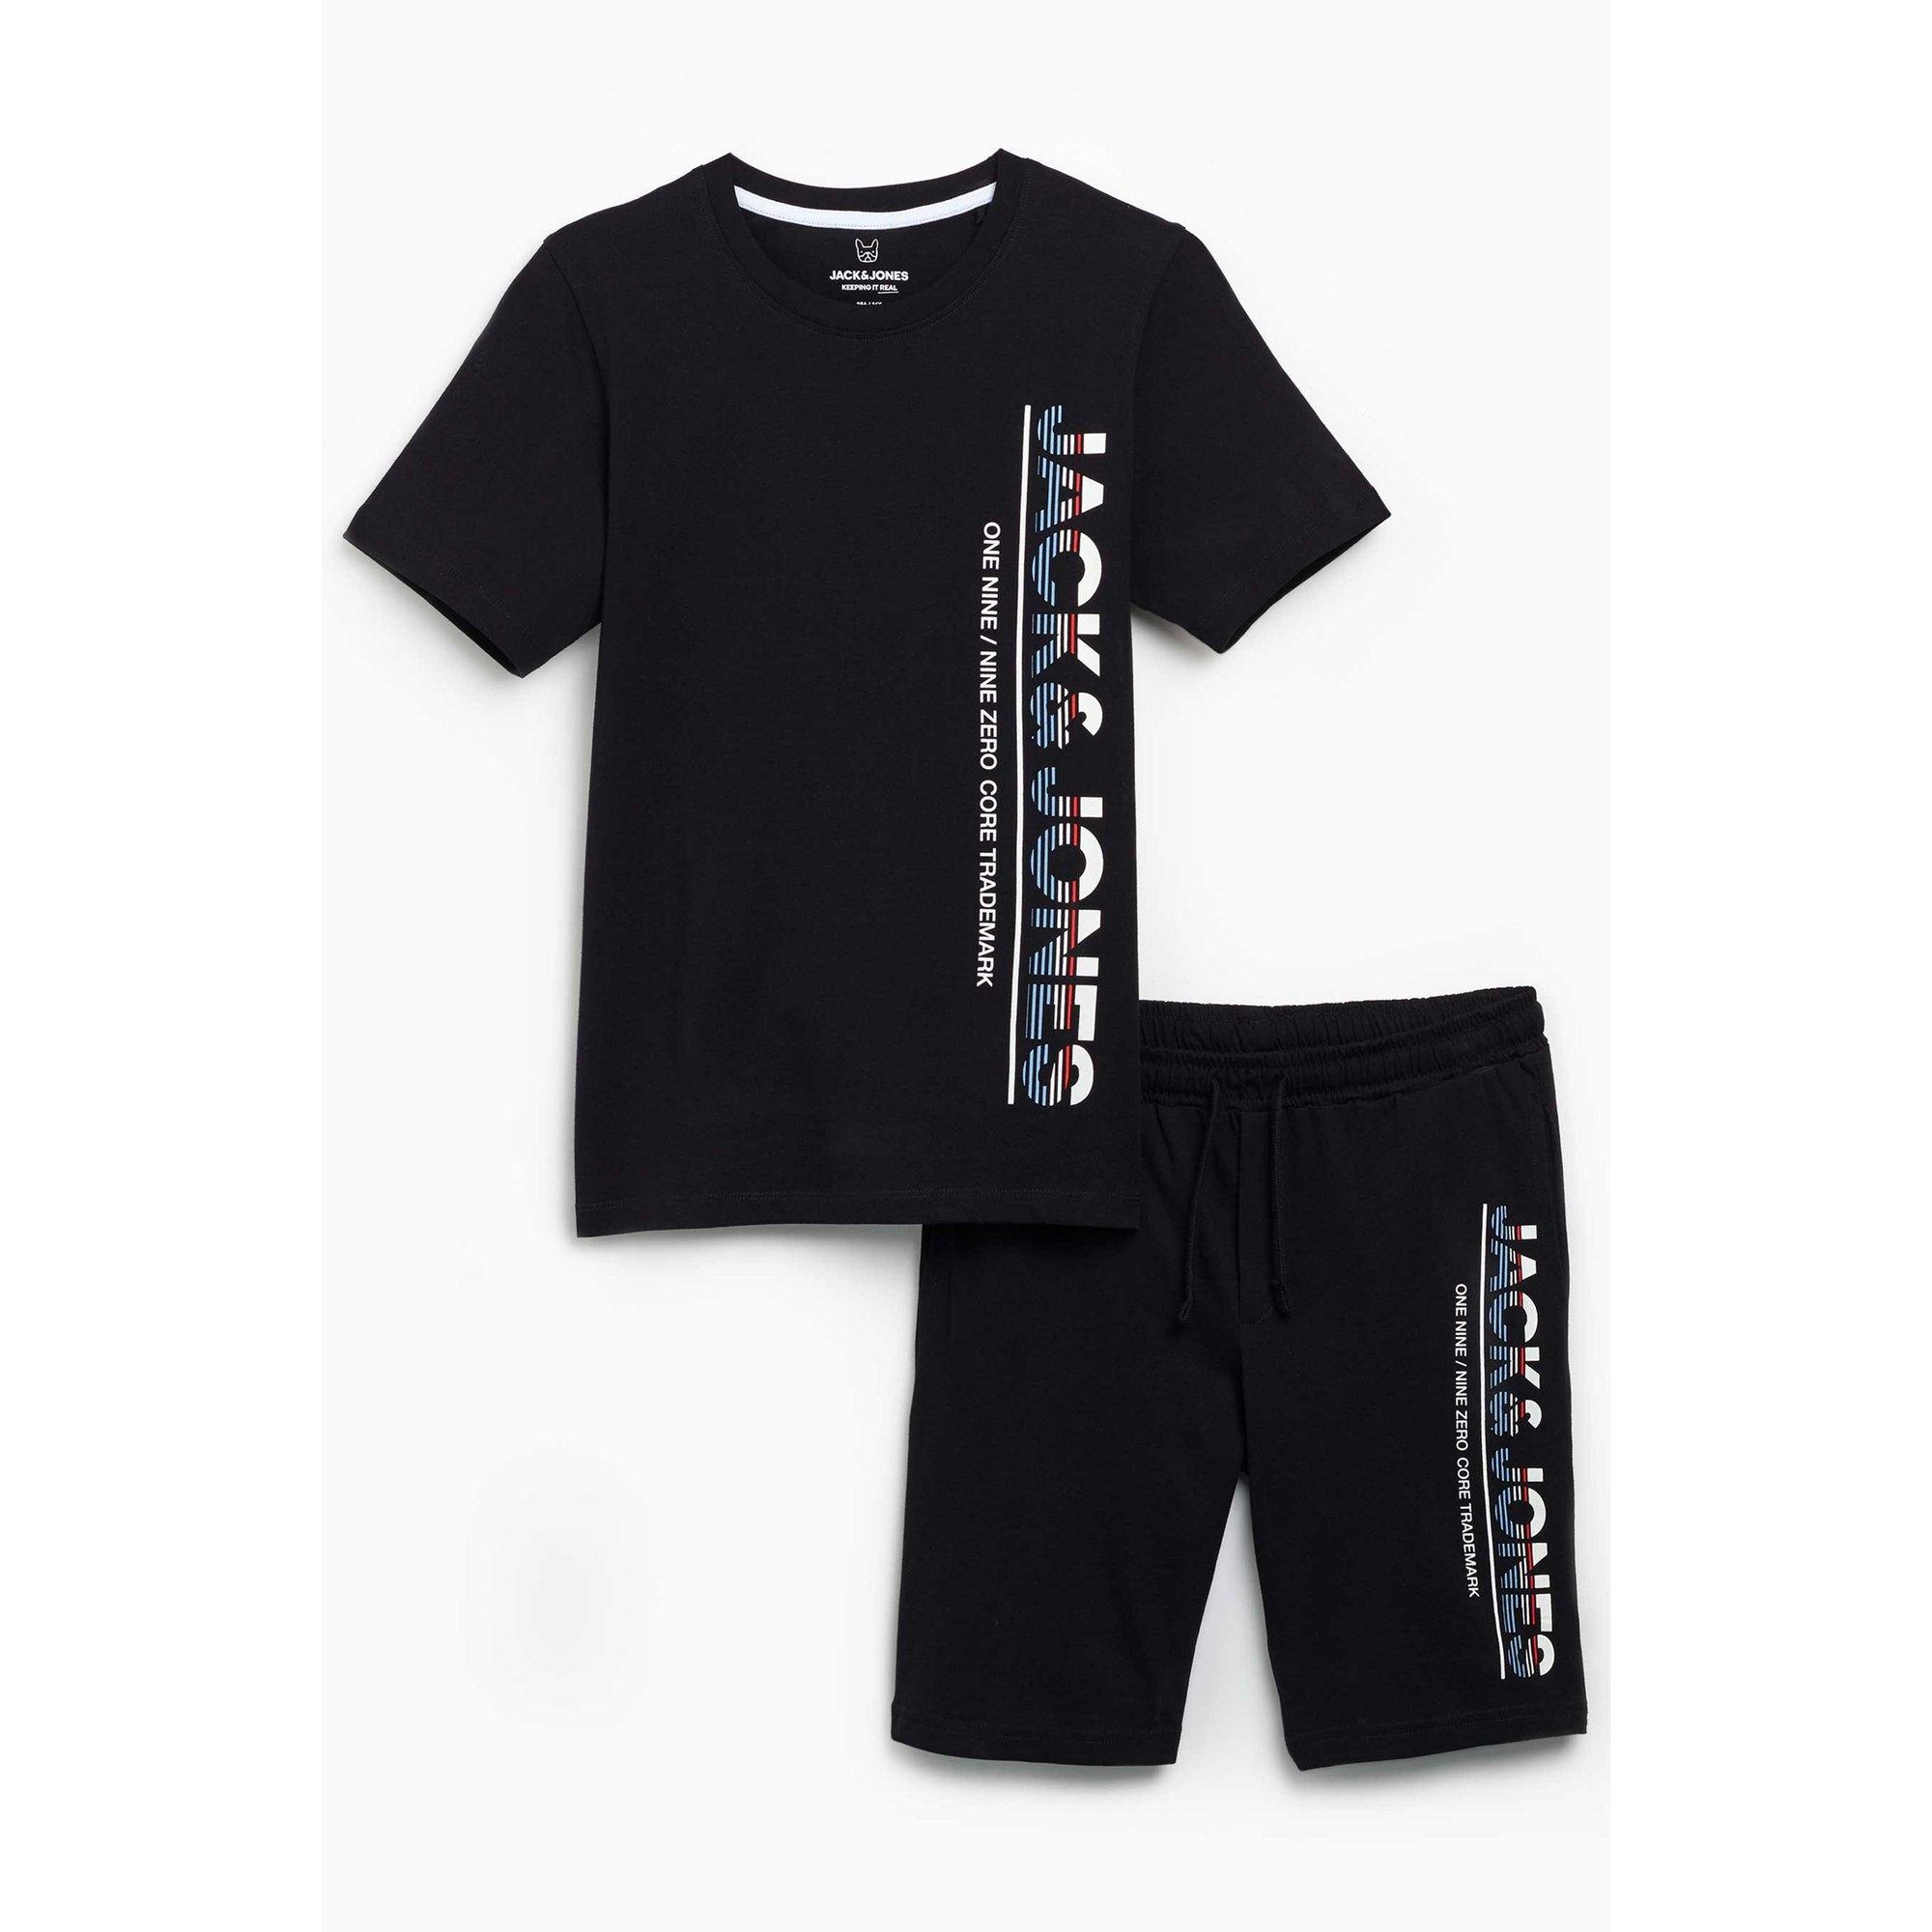 Image of Boys Jack and Jones Black T-Shirt and Shorts Set